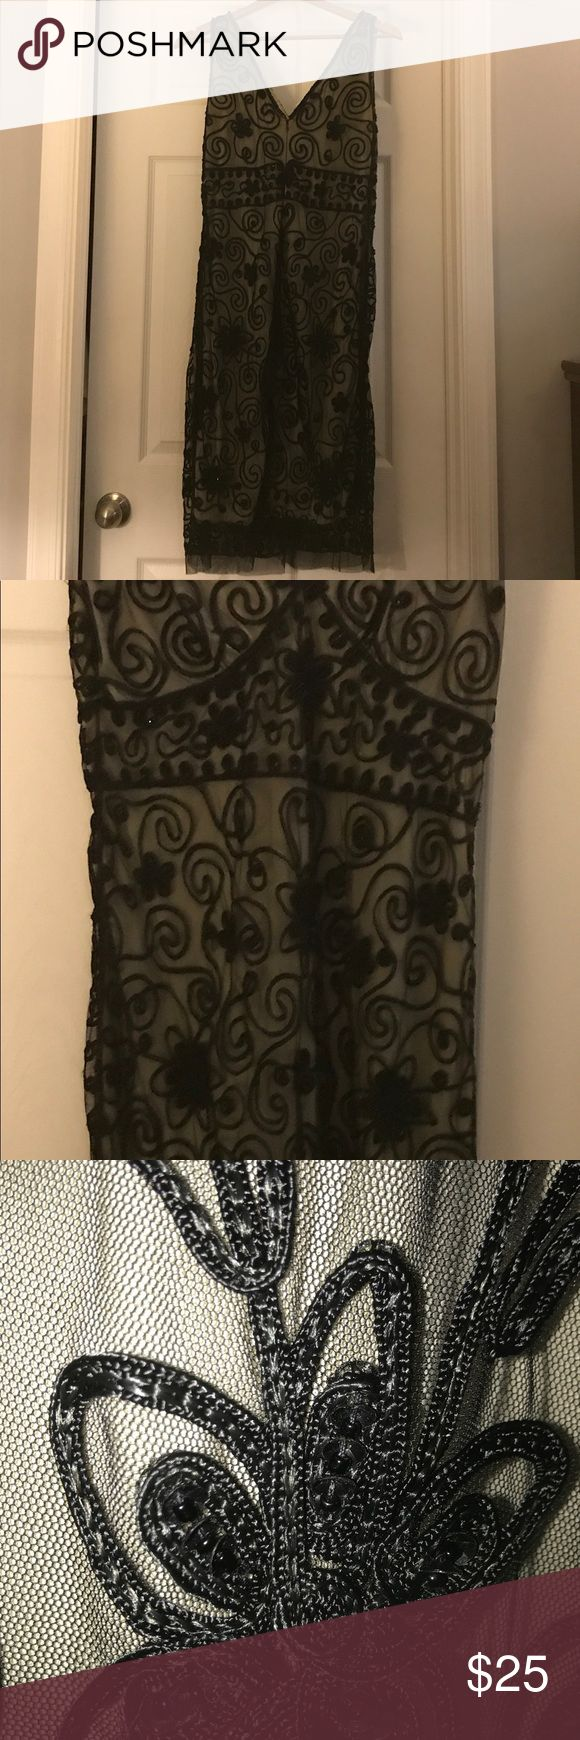 Black Sequin dress Black sequin cocktail dress with scroll pattern netting Pisarro Nights Dresses